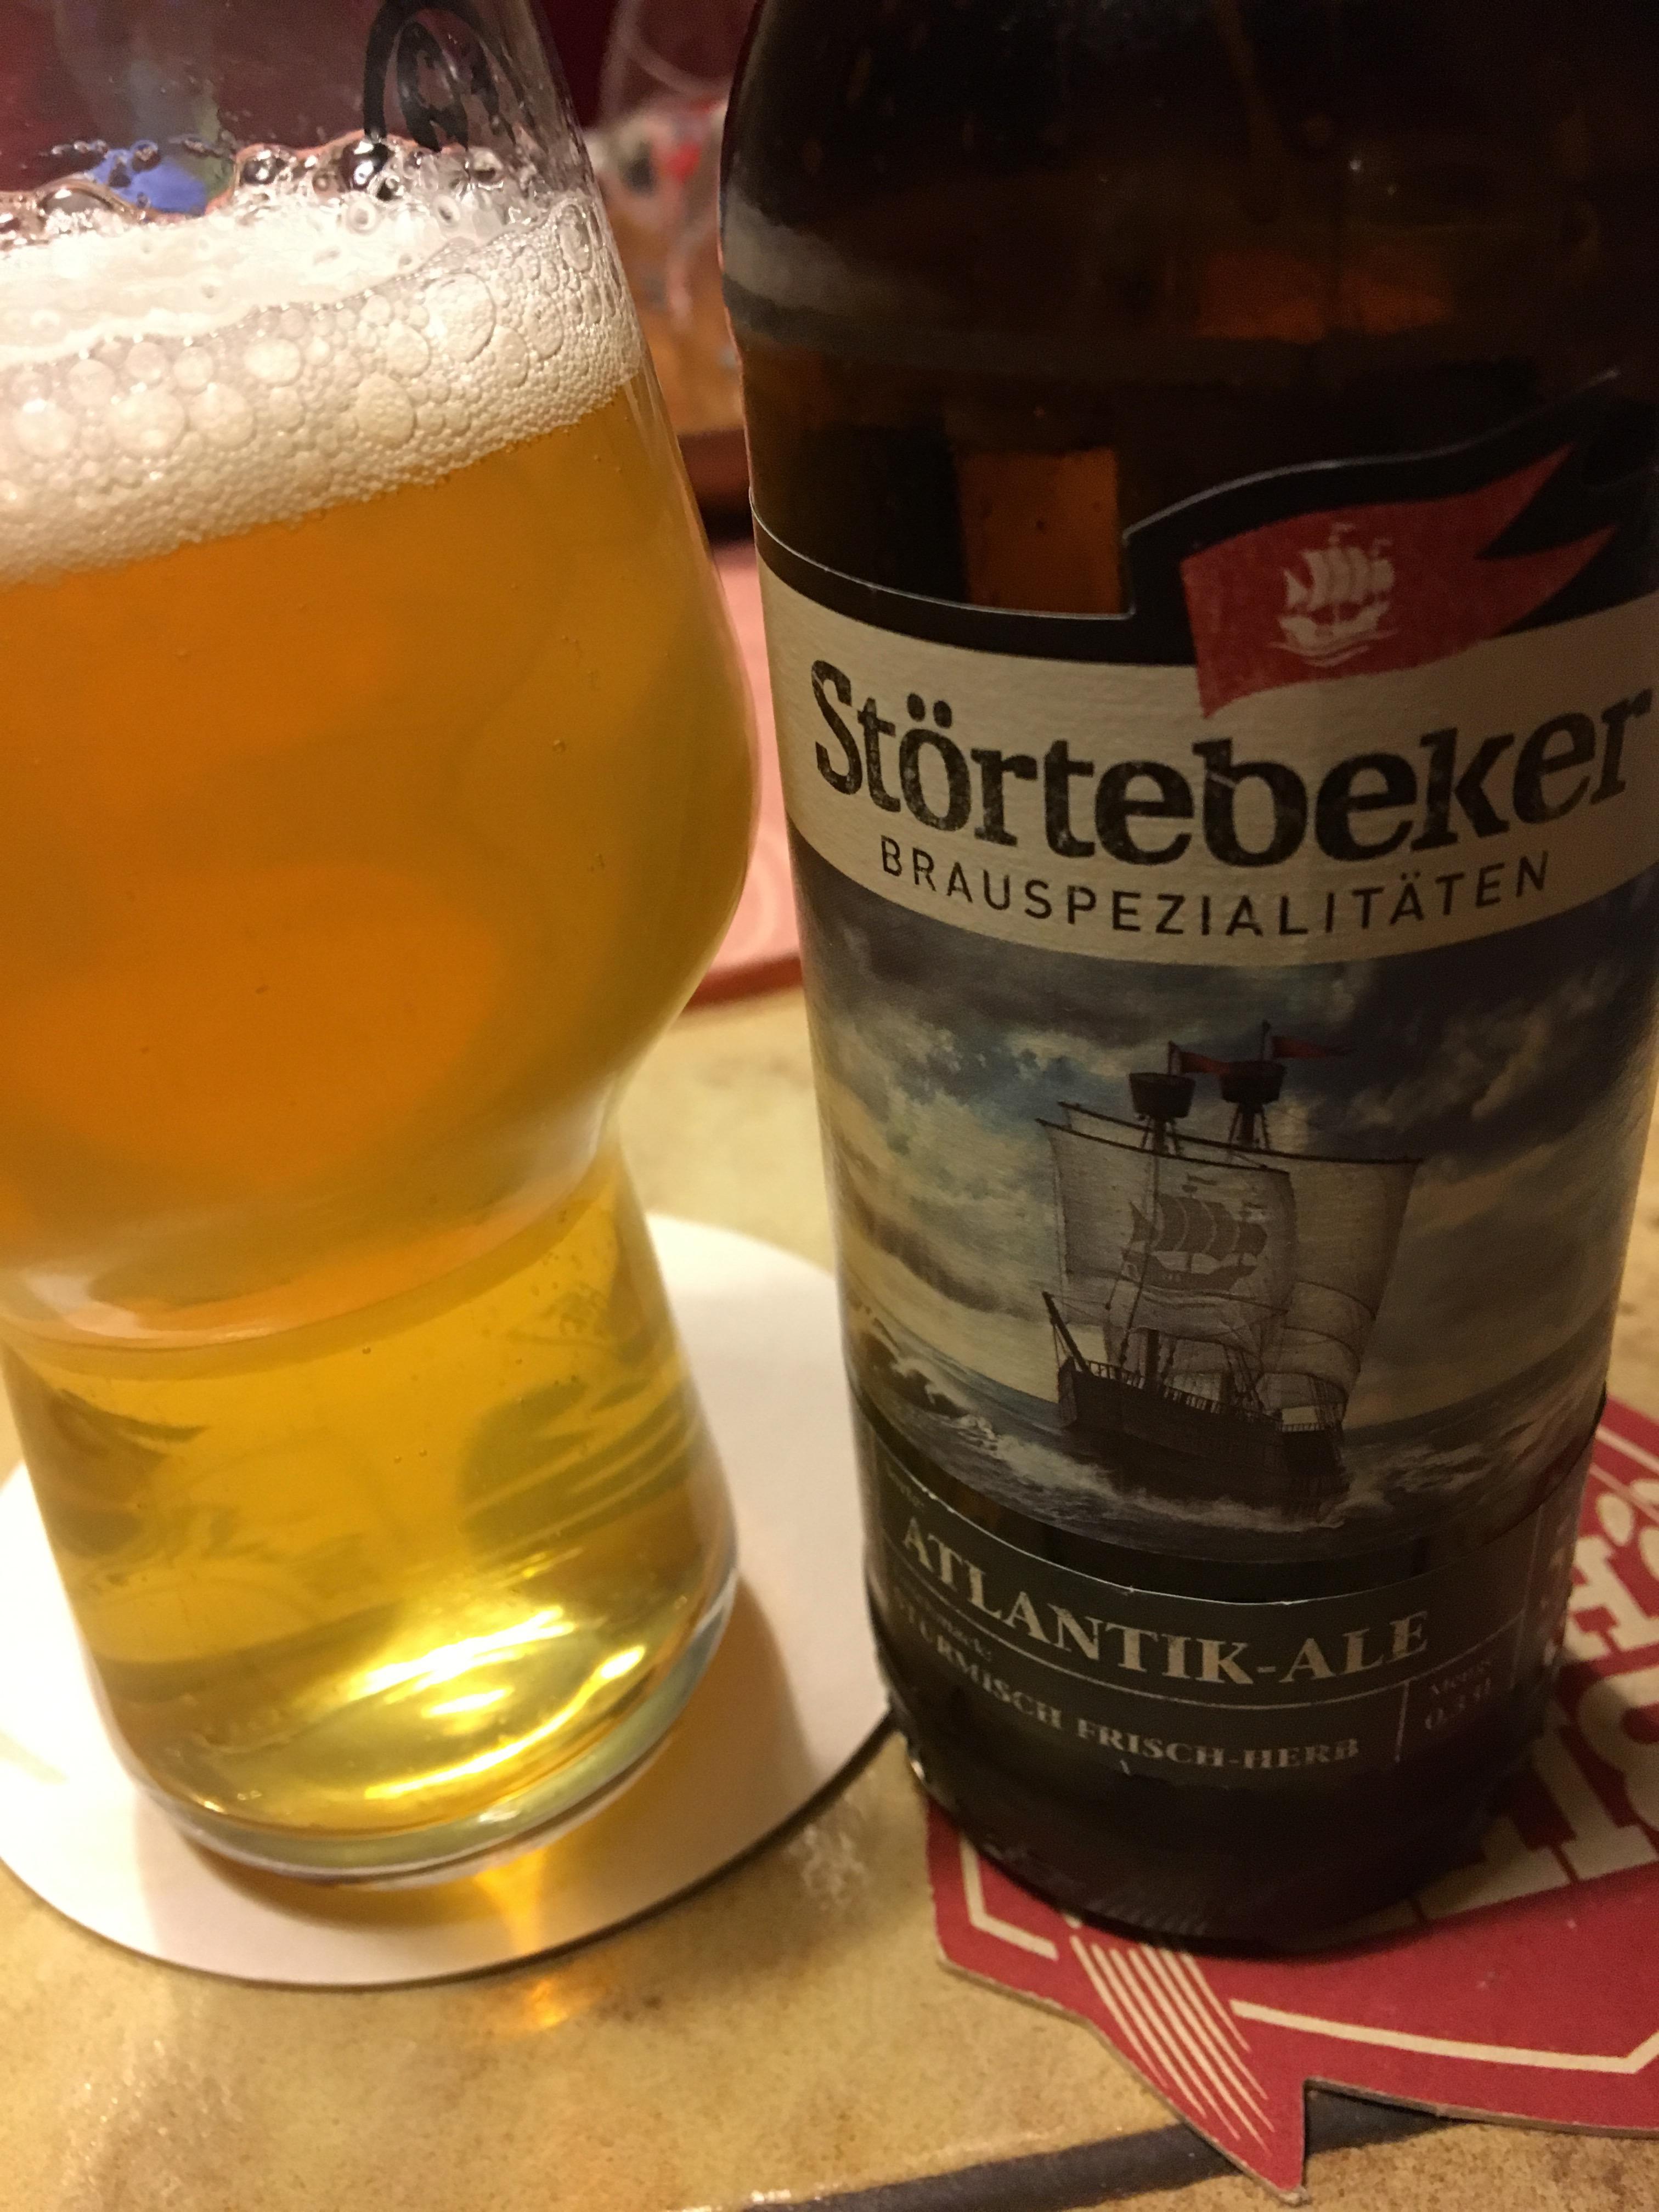 Störtebeker-Atlantik Ale